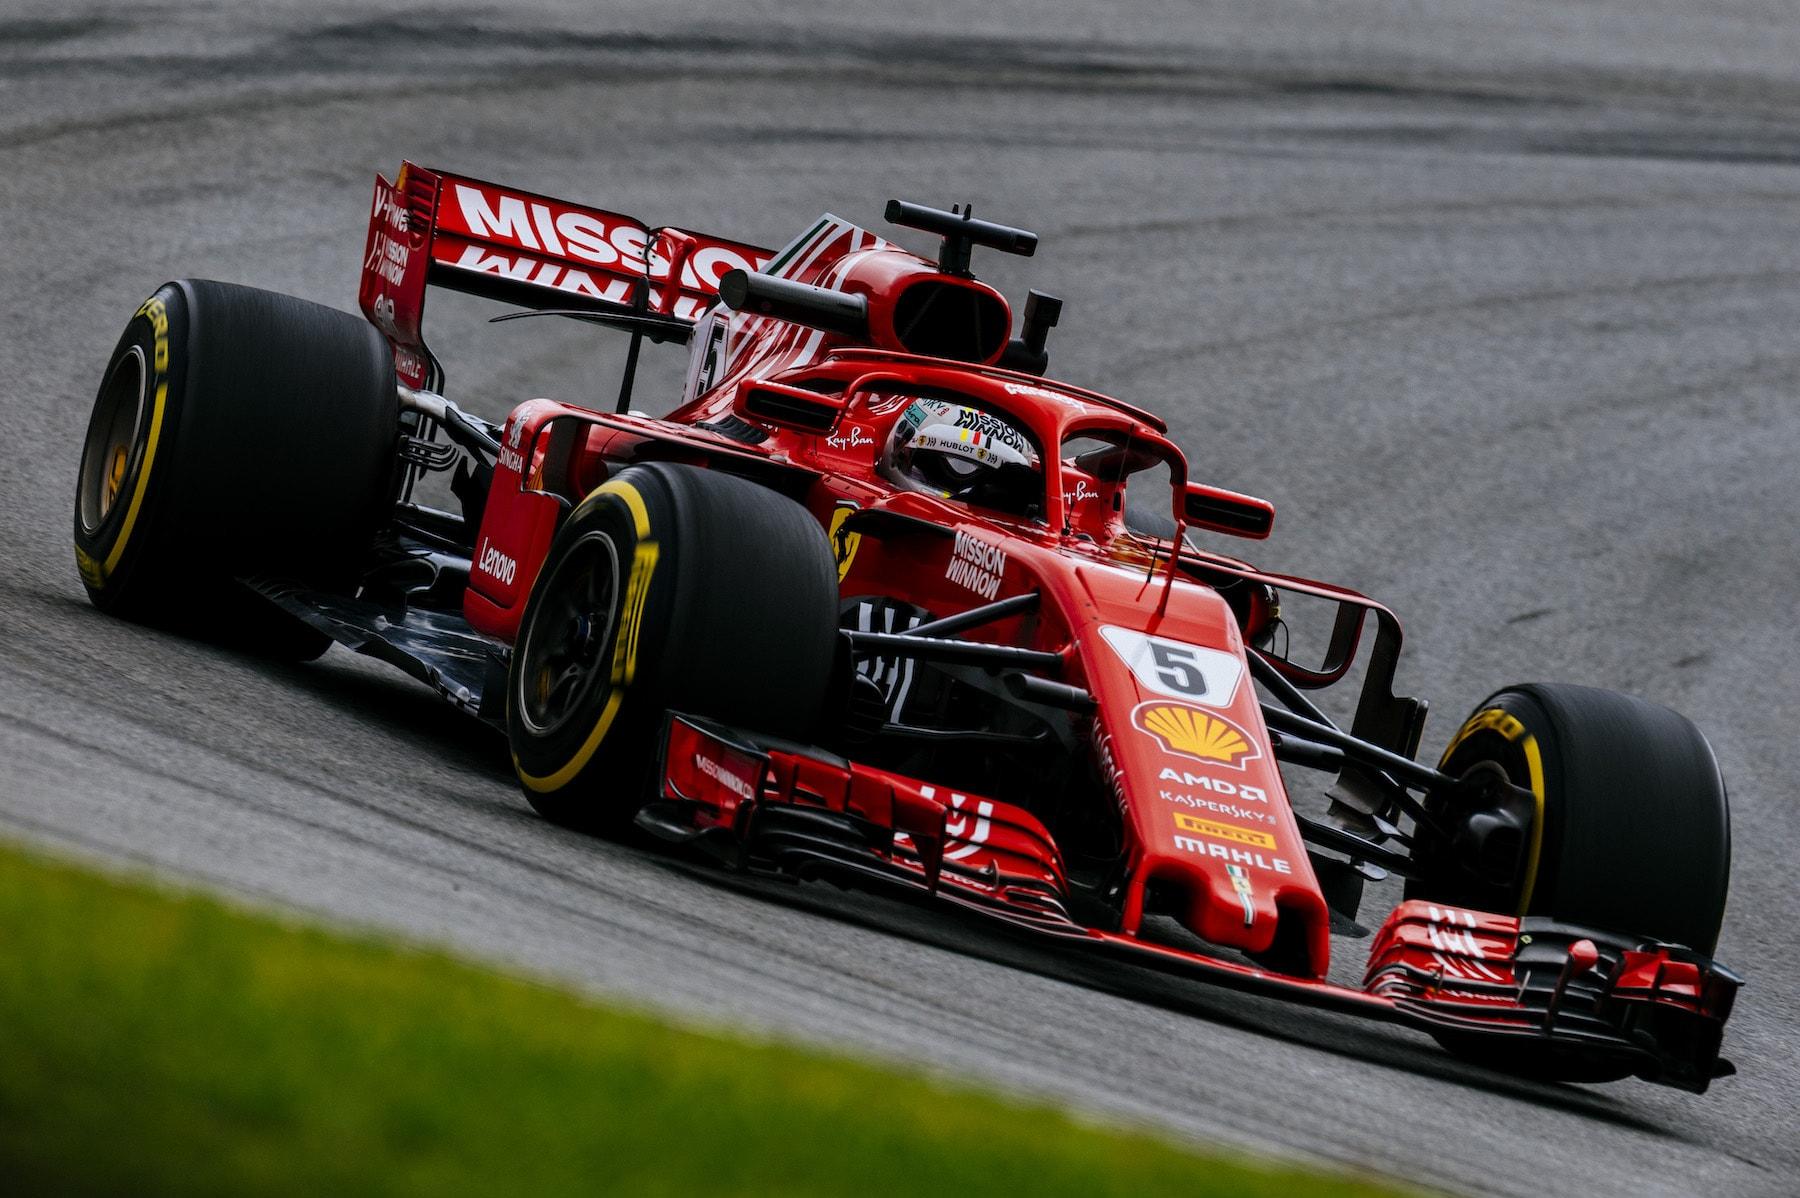 H 2018 Sebastian Vettel | Ferrari SF71H | 2018 Brazilian GP P6 1 copy.jpg